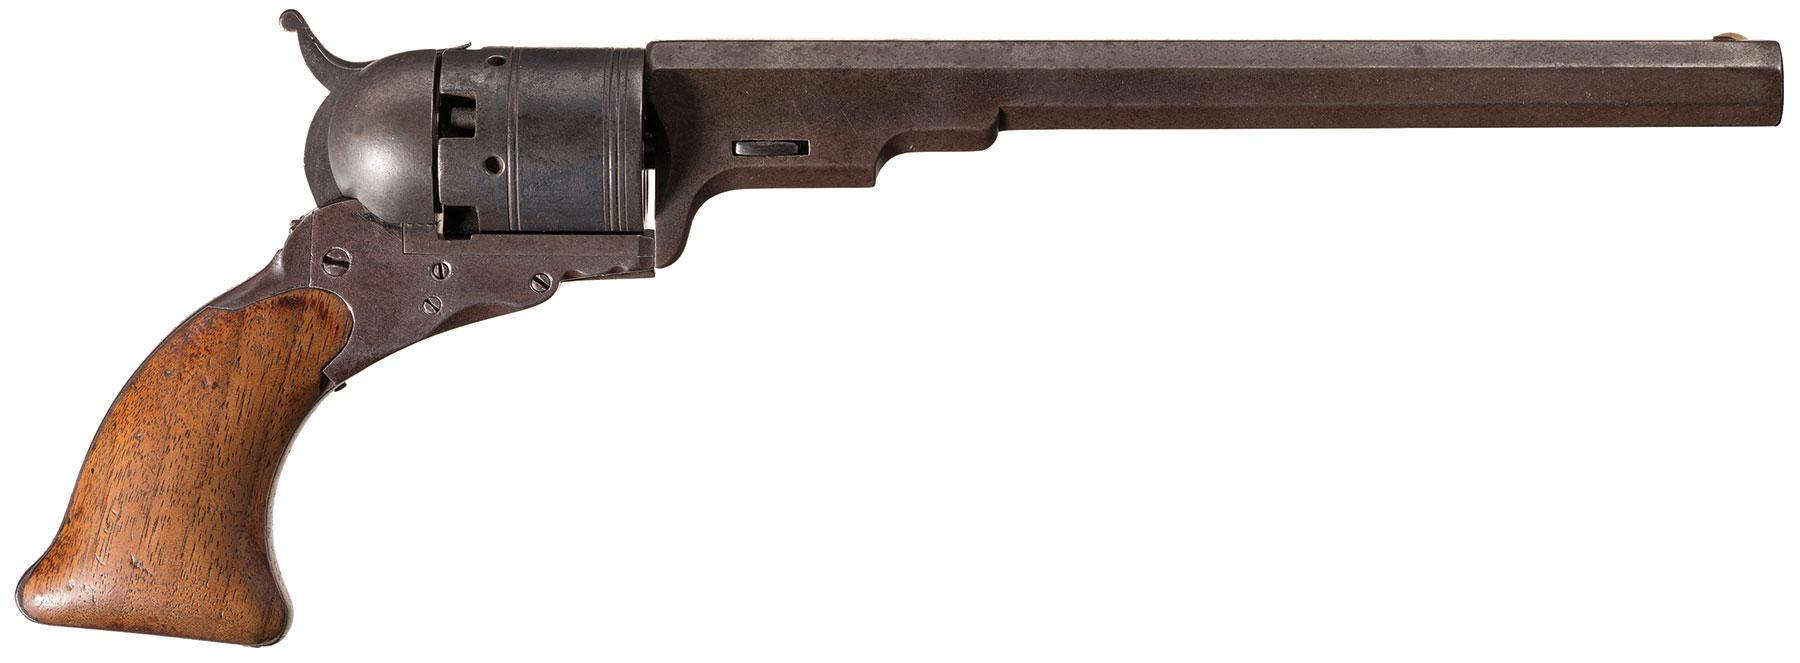 rare colt texas paterson no 5 revolver with period holster